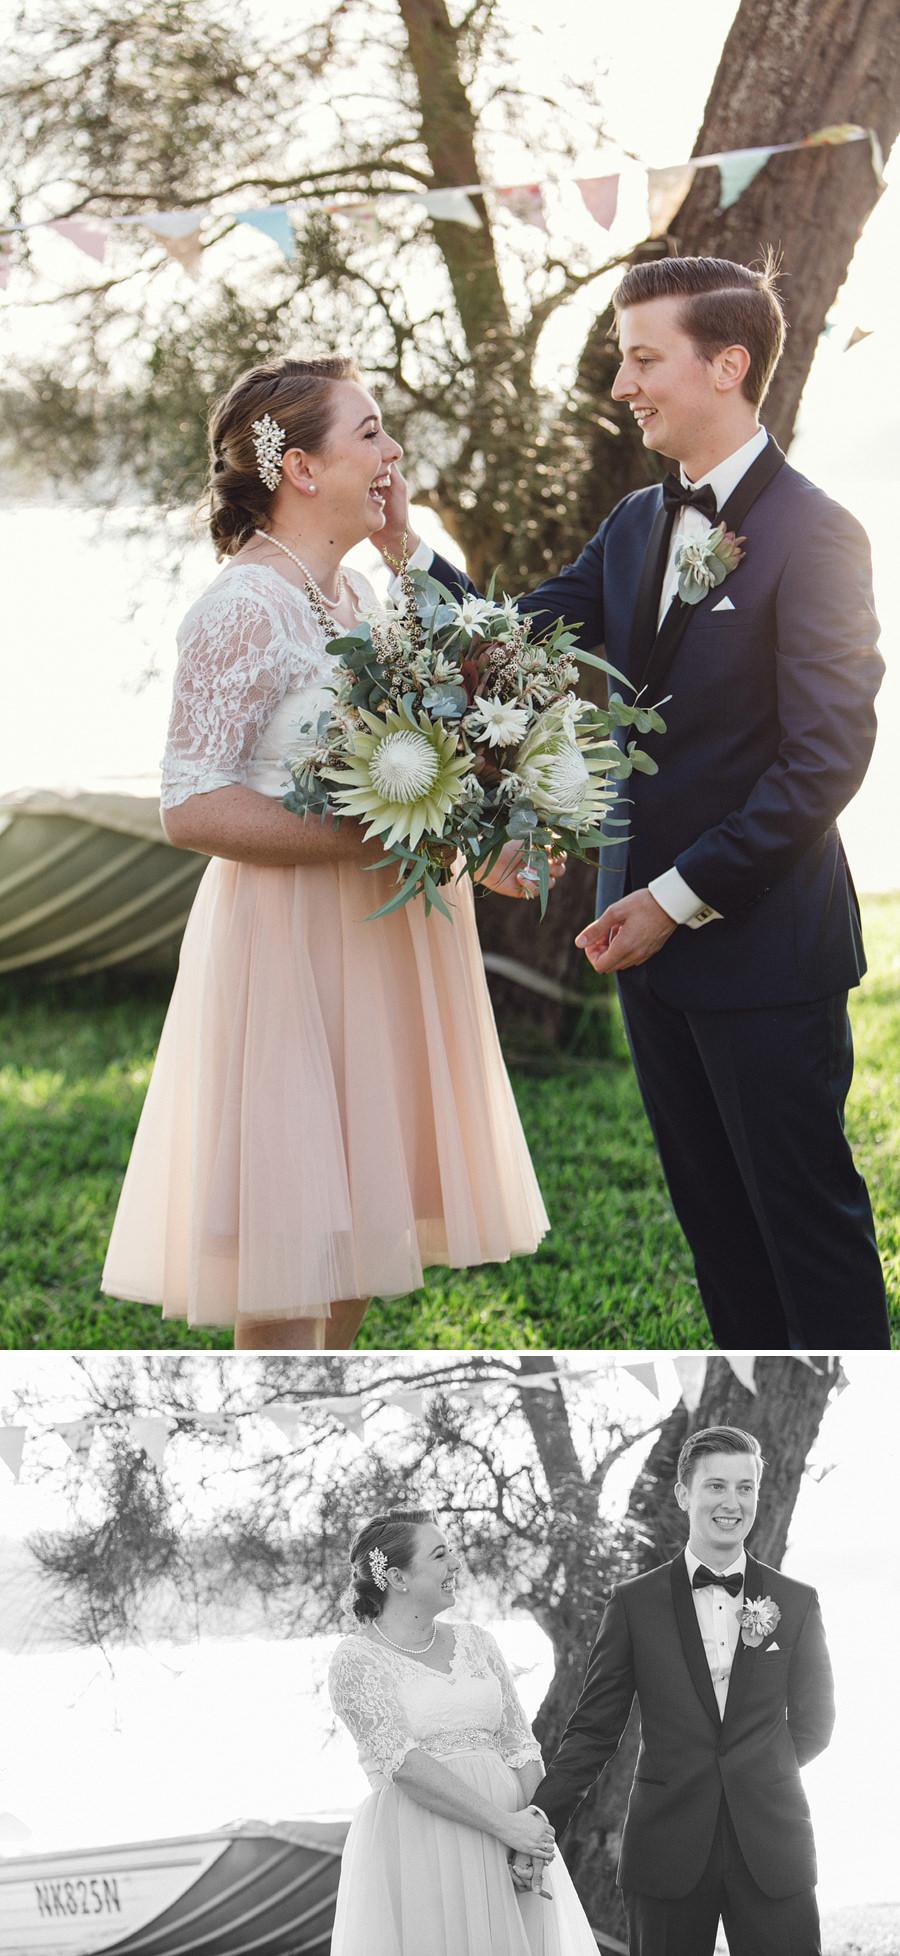 Northern Beaches Wedding Photographer: Ceremony